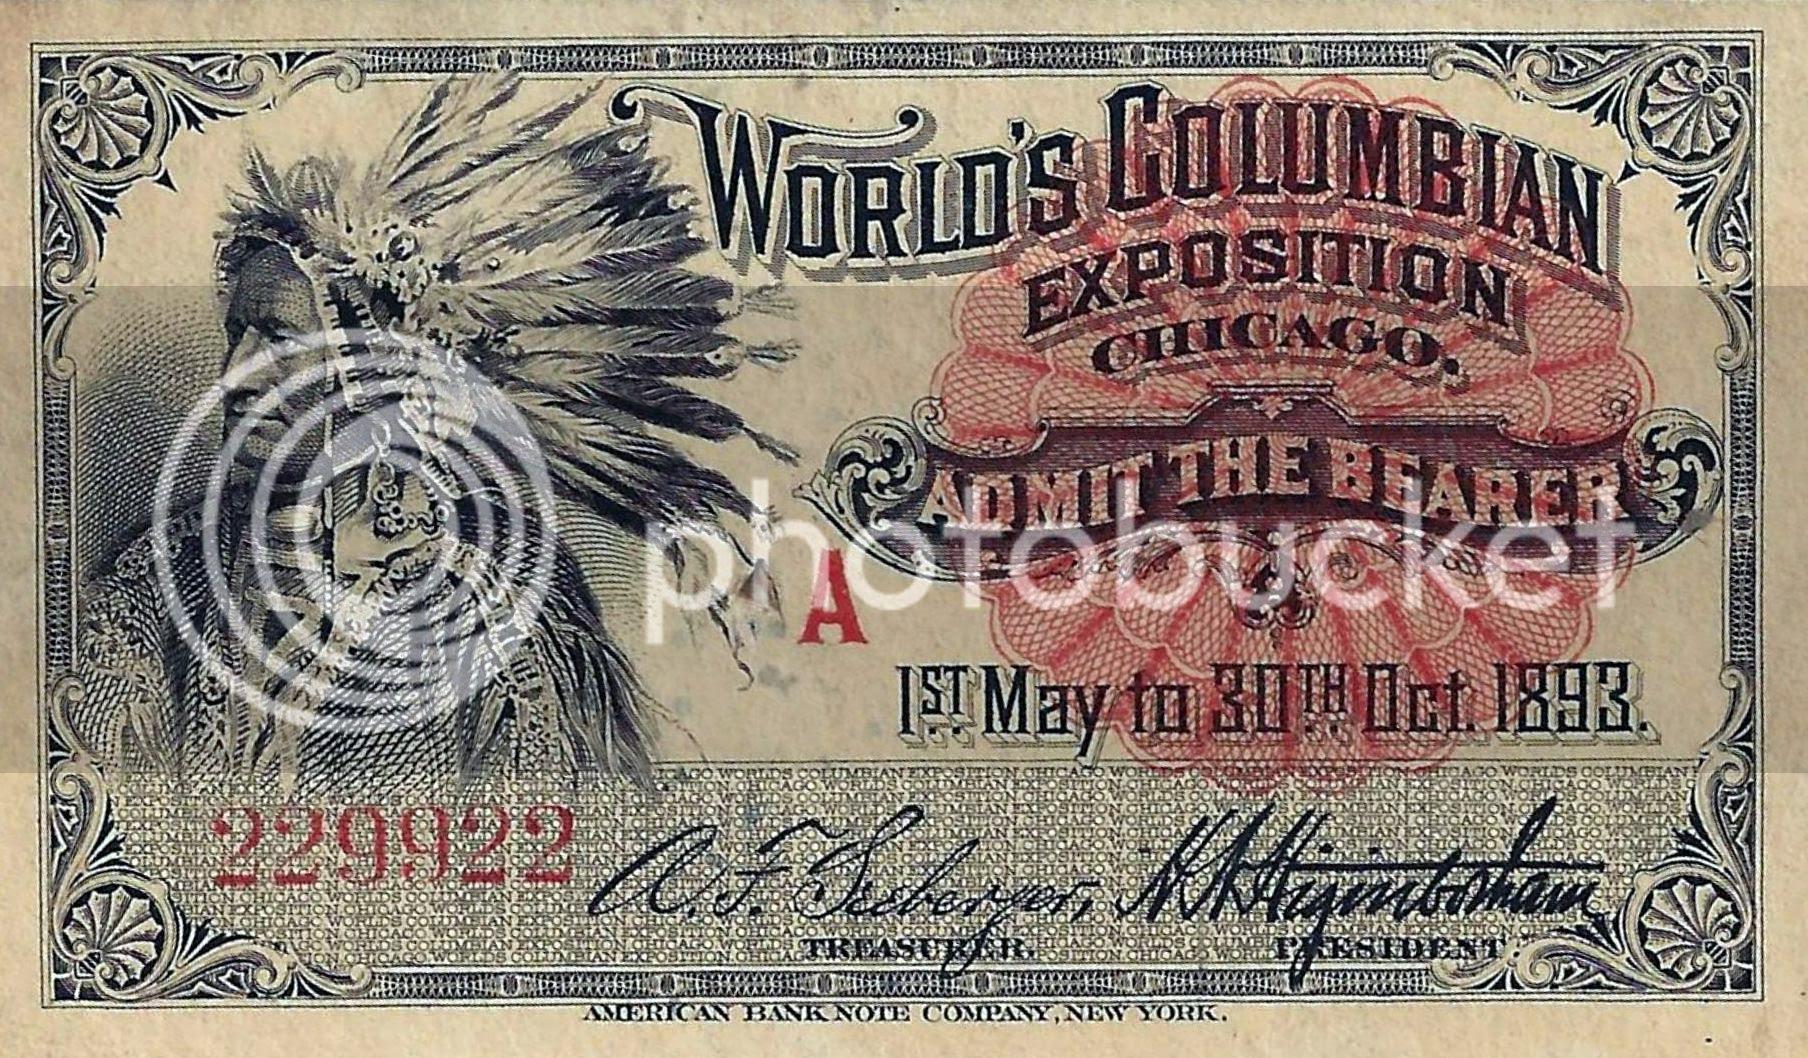 World's Columbian Exposition Chicago Indian photo worldscolumbianexpositionchicago1893indianticket_zps4b40c9ed.jpg